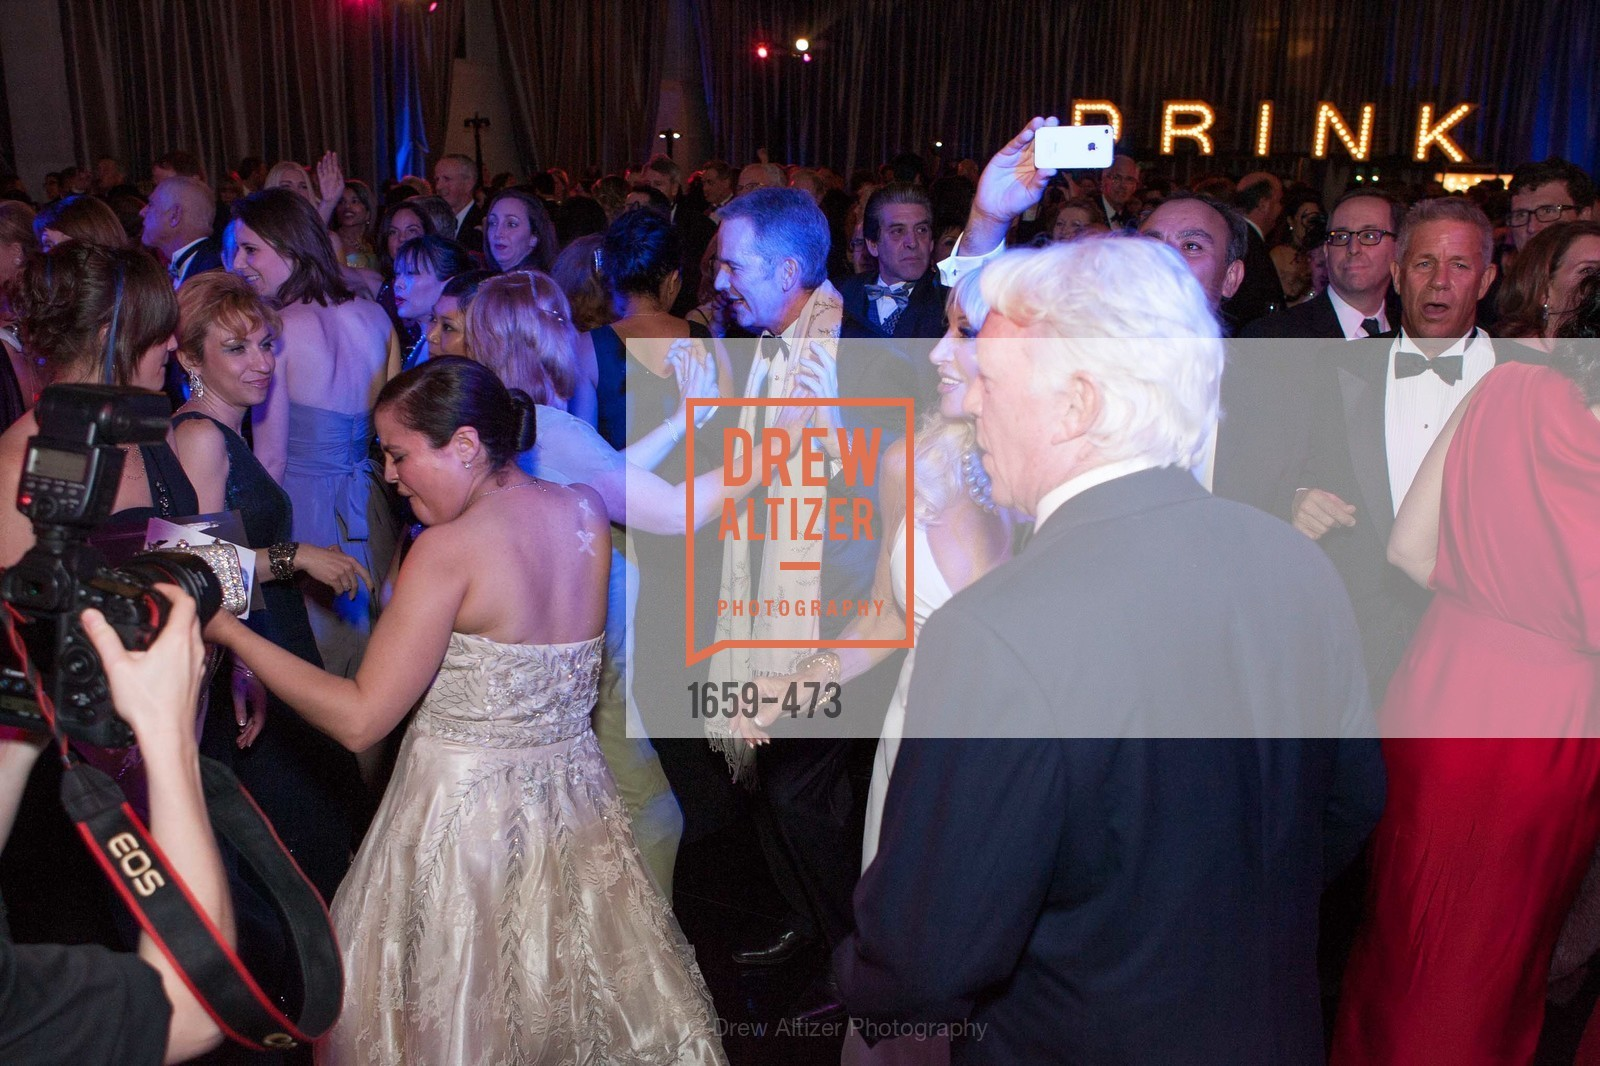 Dance Floor, ENCORE! at San Francisco BALLET'S 2014 Season Opening Night Gala, US. US, January 22nd, 2014,Drew Altizer, Drew Altizer Photography, full-service agency, private events, San Francisco photographer, photographer california